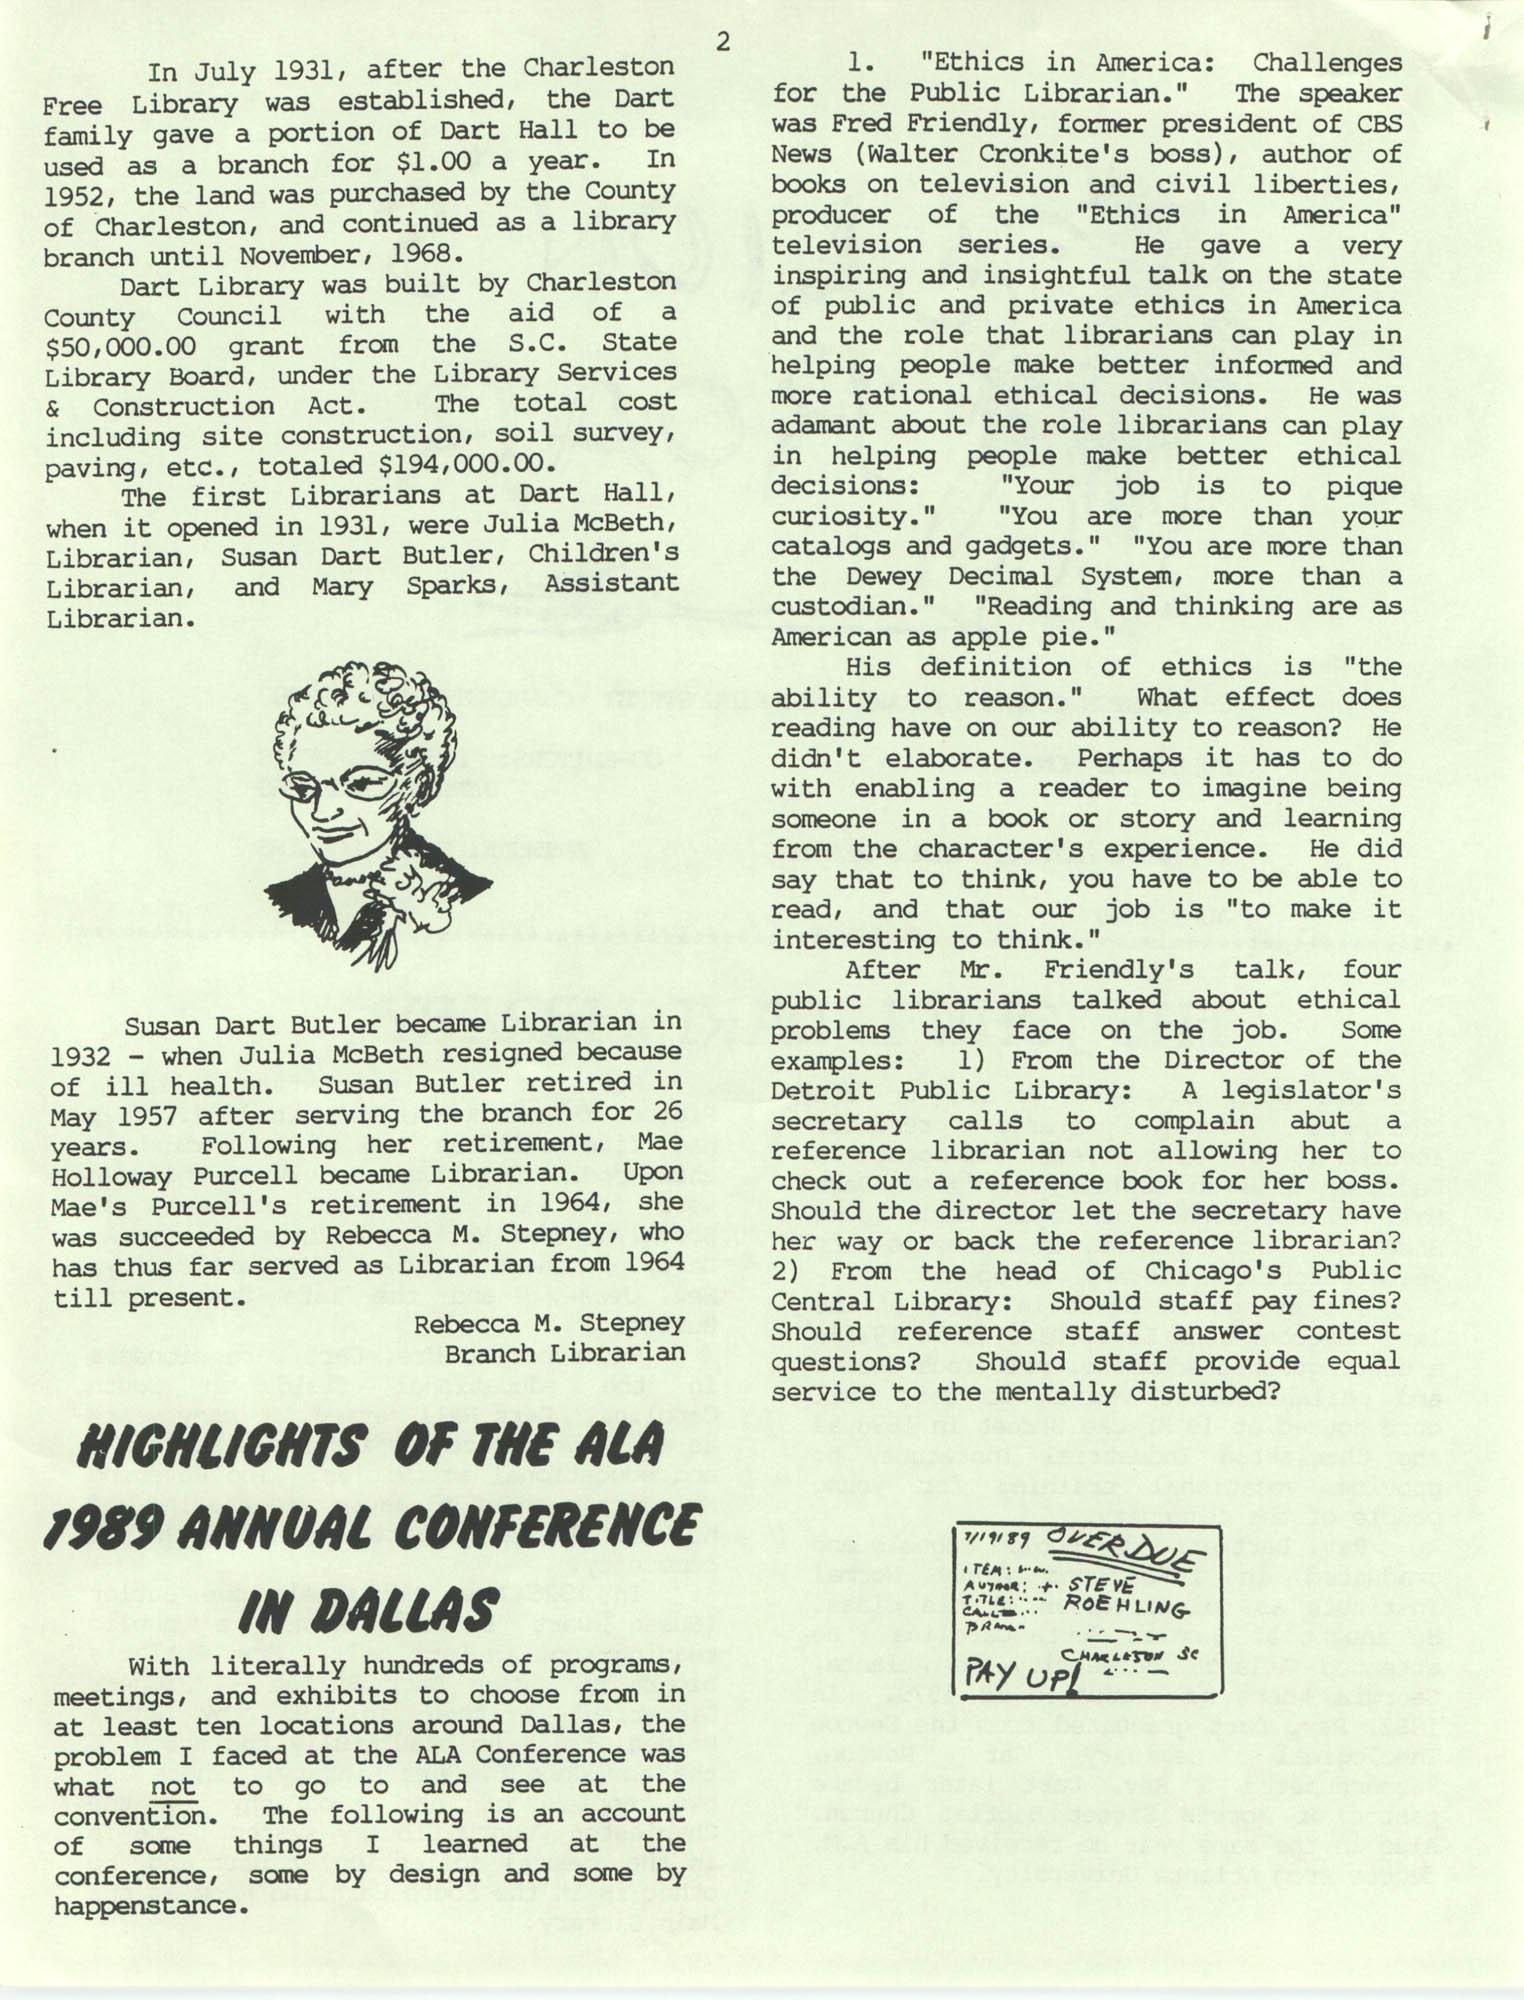 The Lion's Roar, July 1989, Page 2